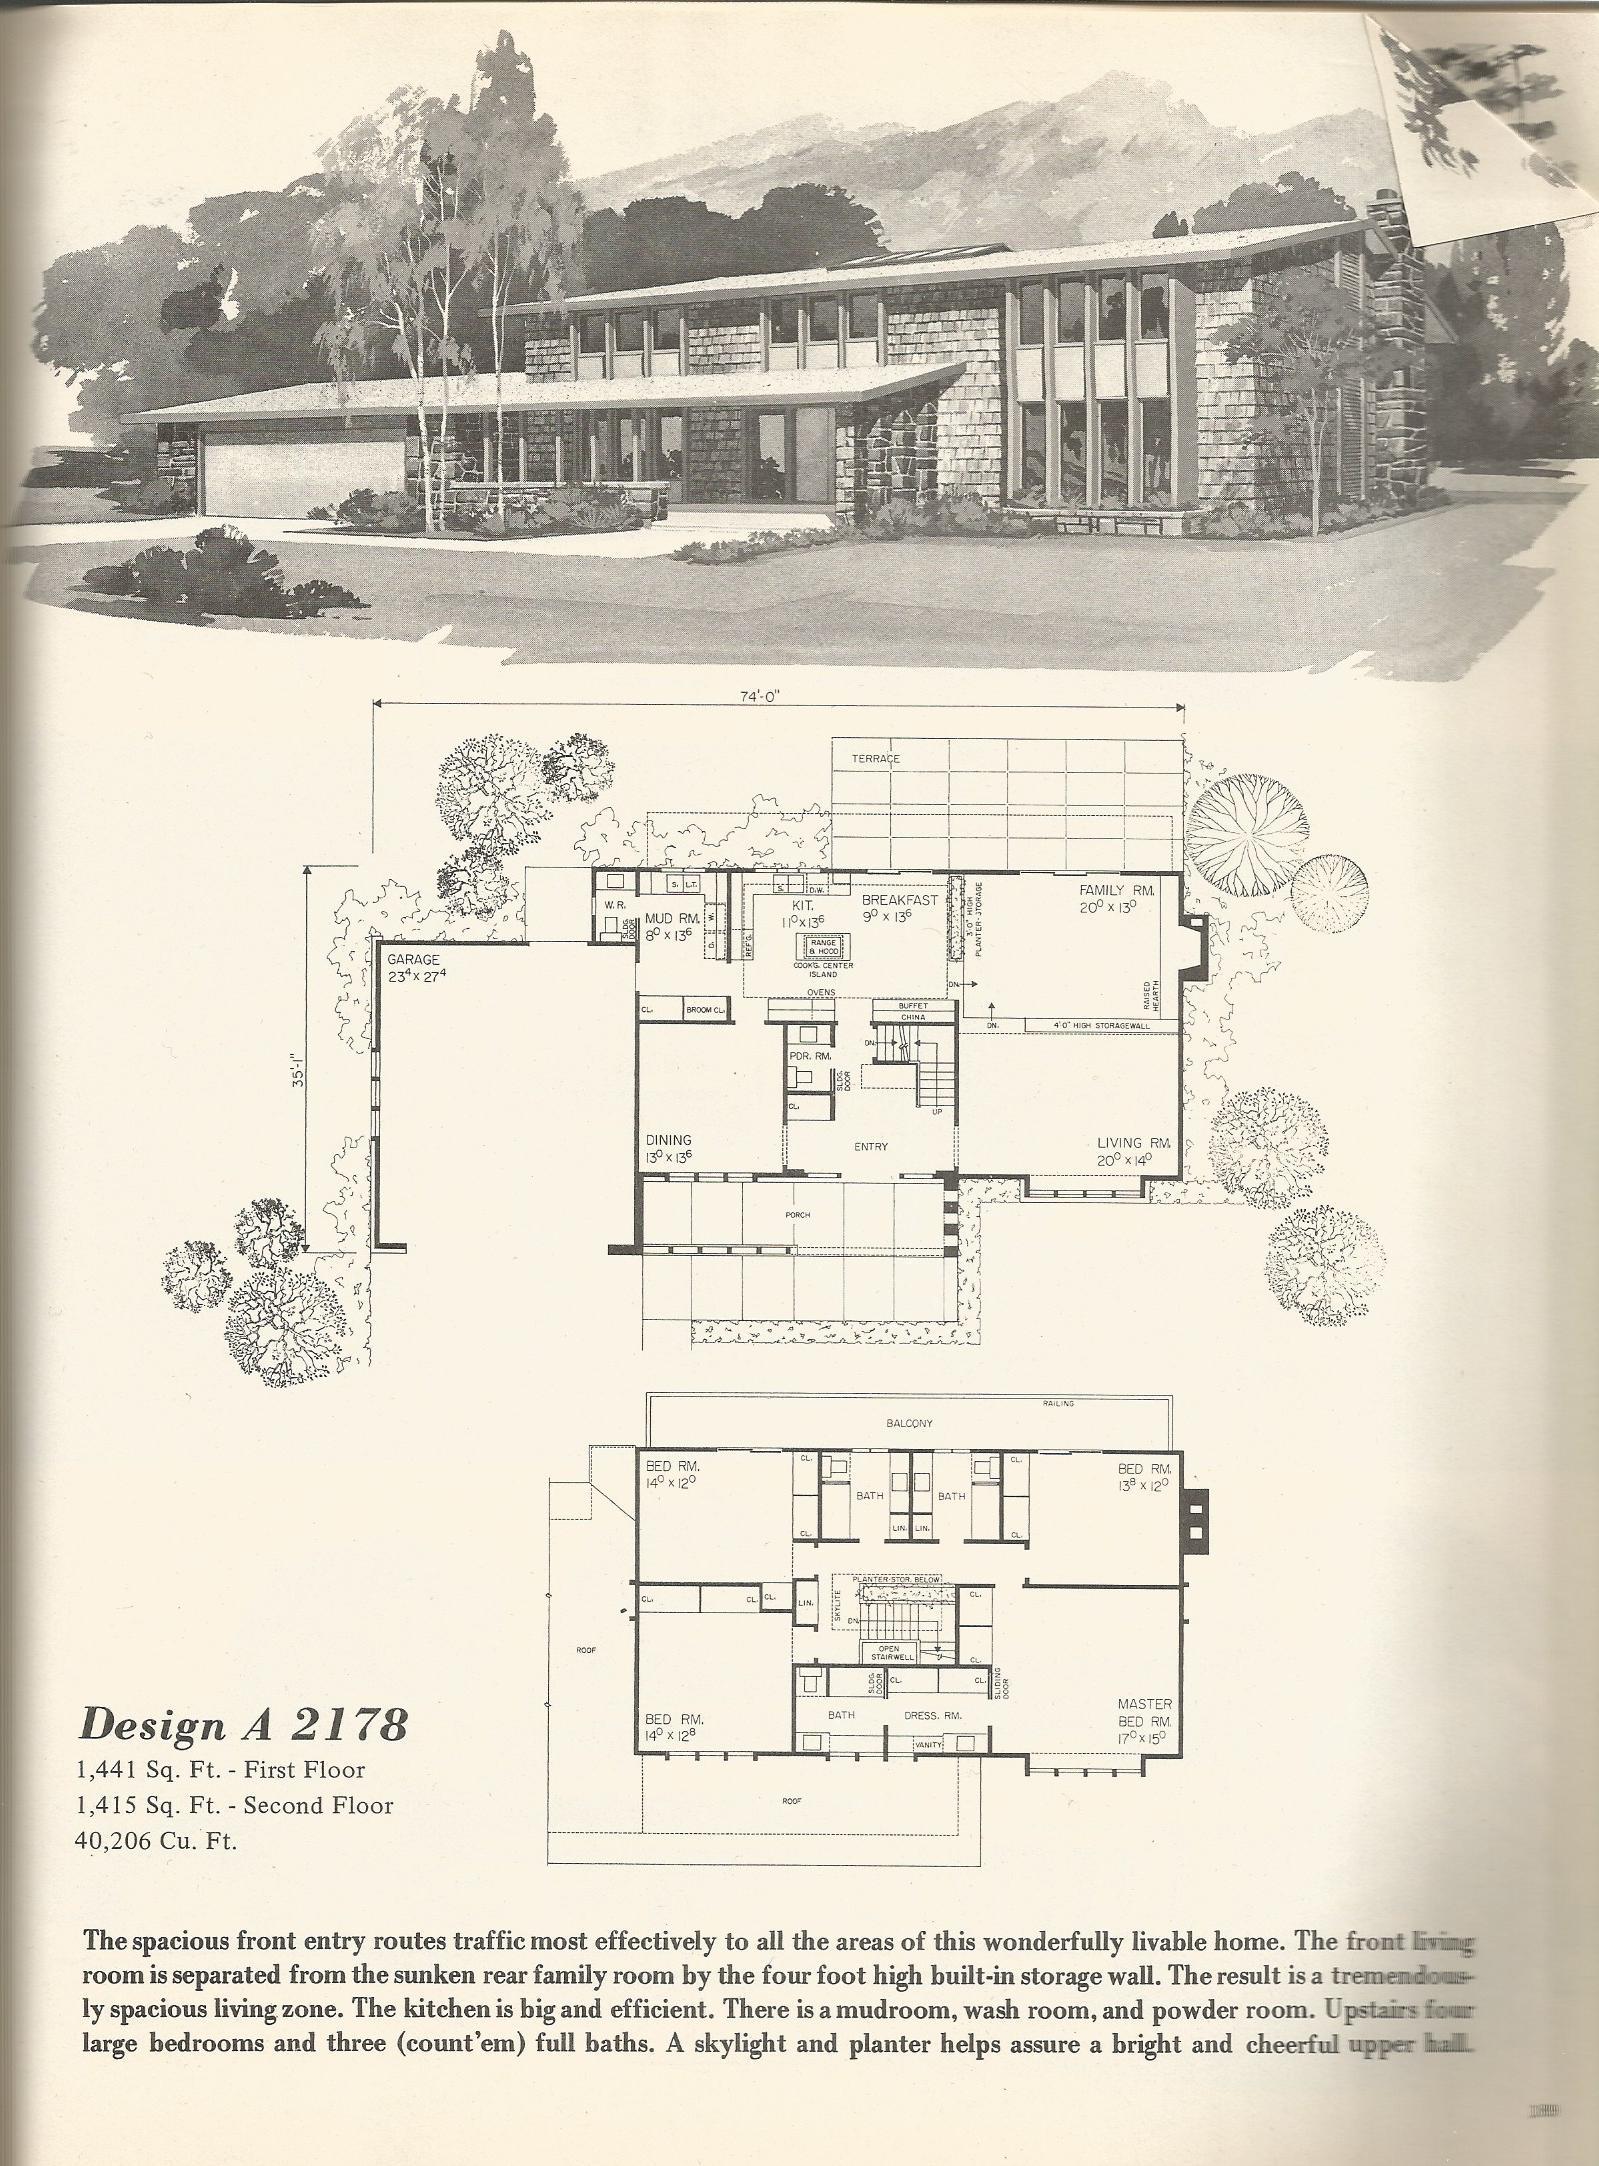 Vintage house plans 2178 antique alter ego for Antique house floor plans